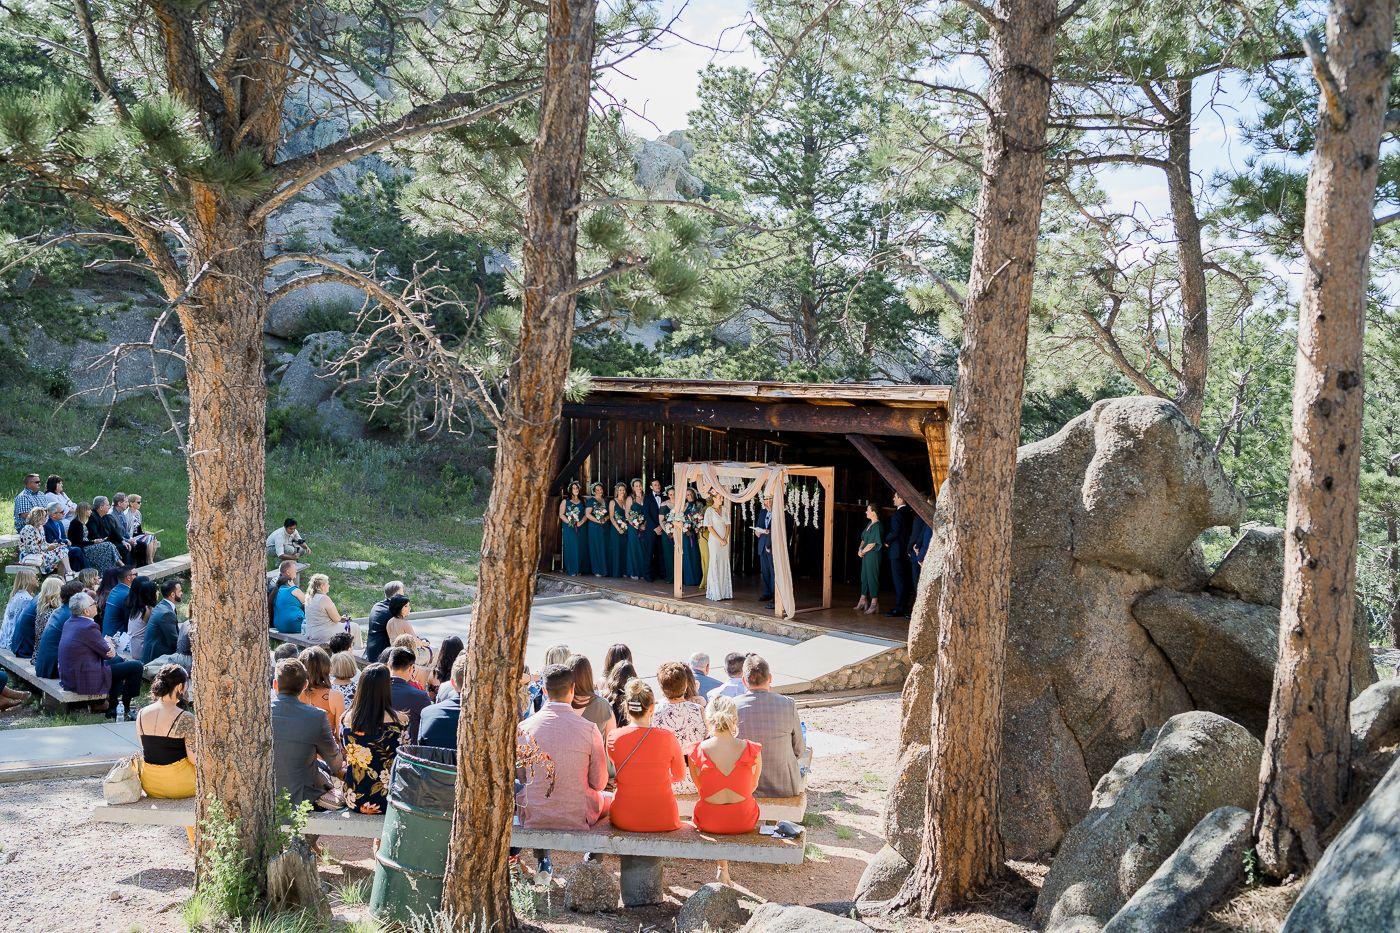 Alex & Shanele Wyoming weddings, Wyoming, State parks